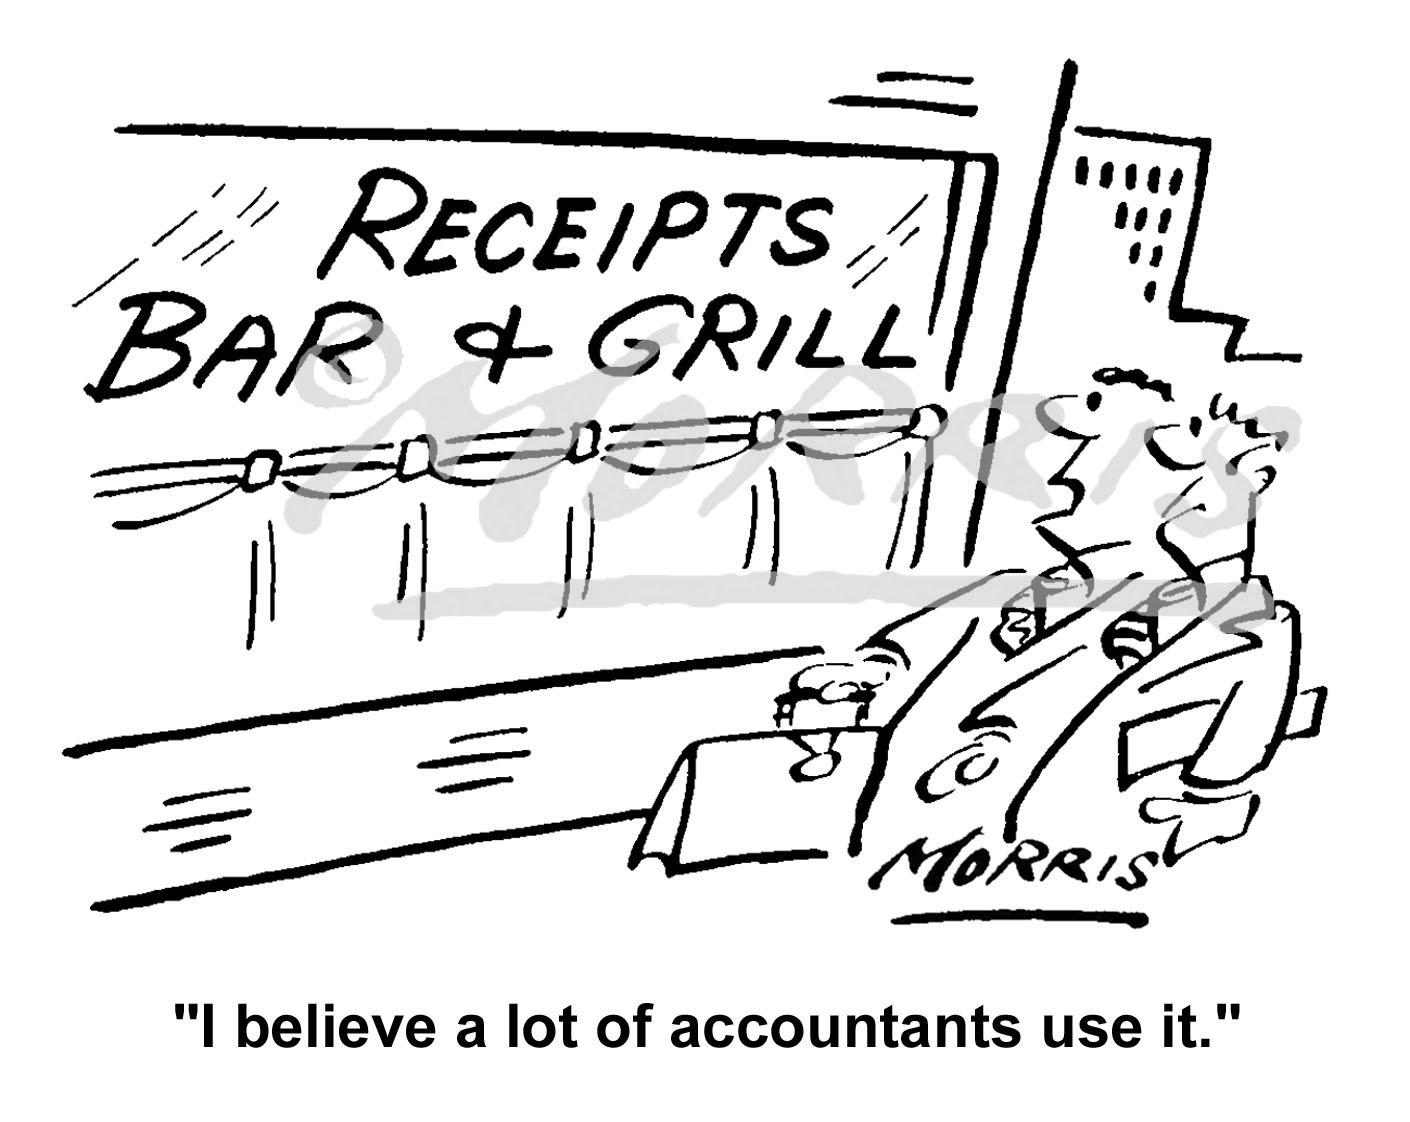 Accountancy business cartoon – Ref: 3320bw